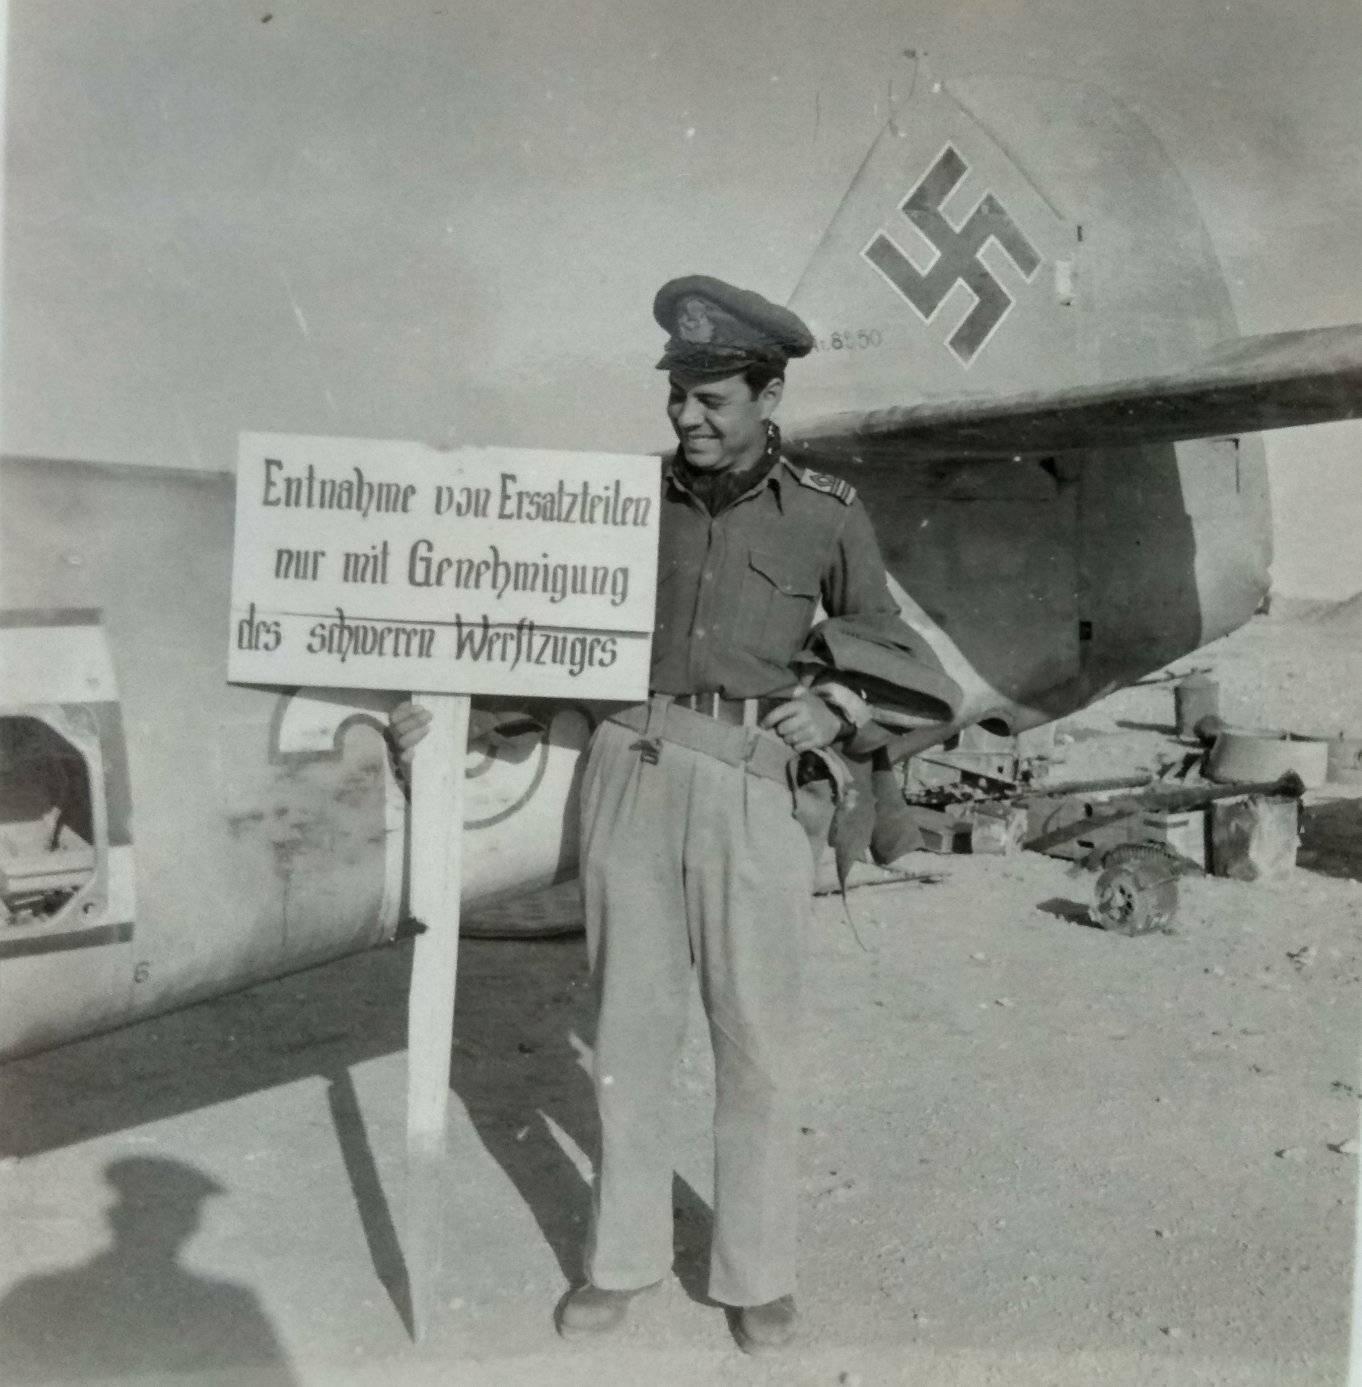 Messerschmitt Bf 109F4Trop 9.JG27 Yellow 9 WNr 8550 abandoned at Bir el Abd 13th Nov 1942 ebay1